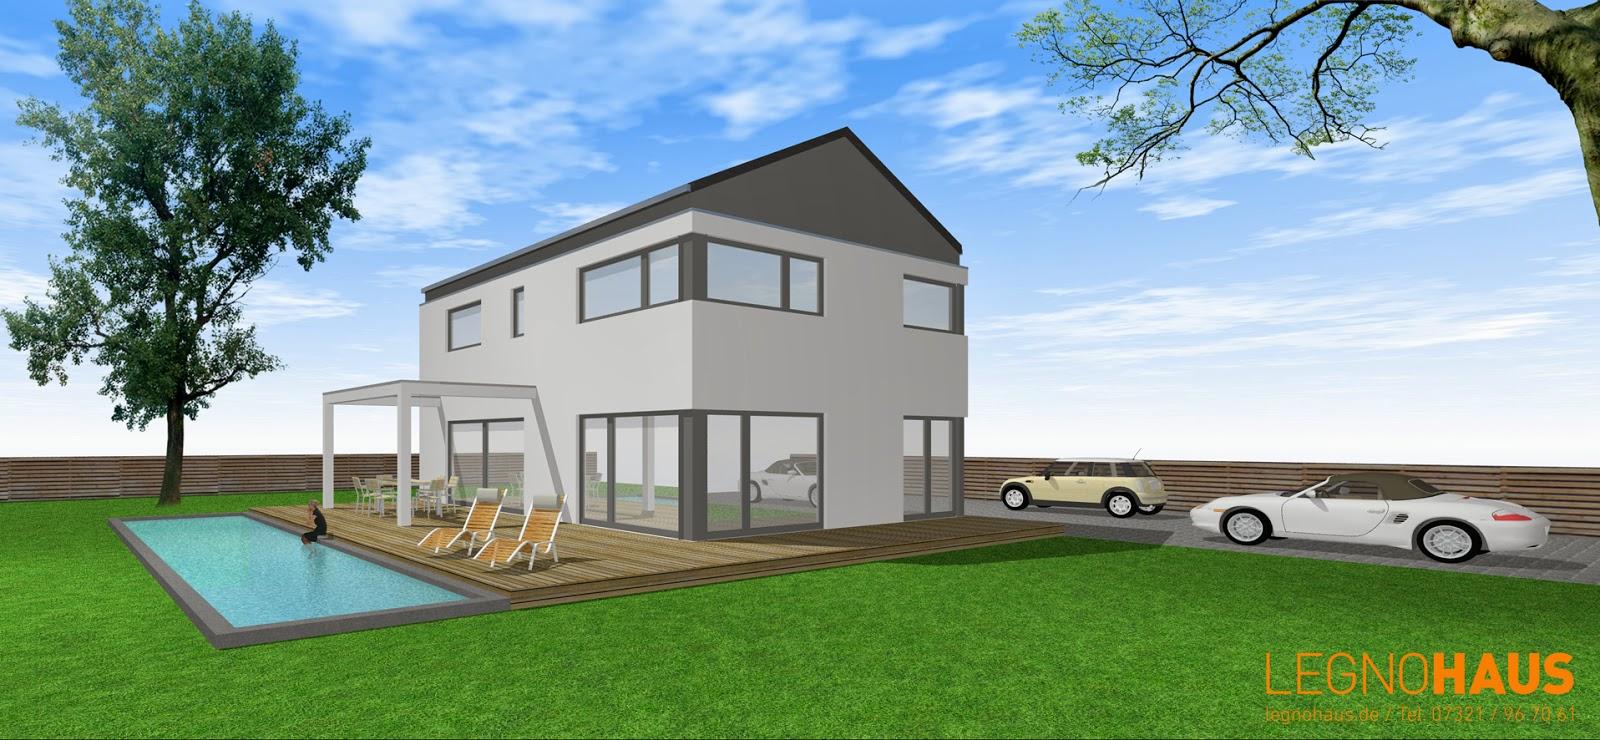 serie legnohaus ul bauhaus wohnhaus. Black Bedroom Furniture Sets. Home Design Ideas